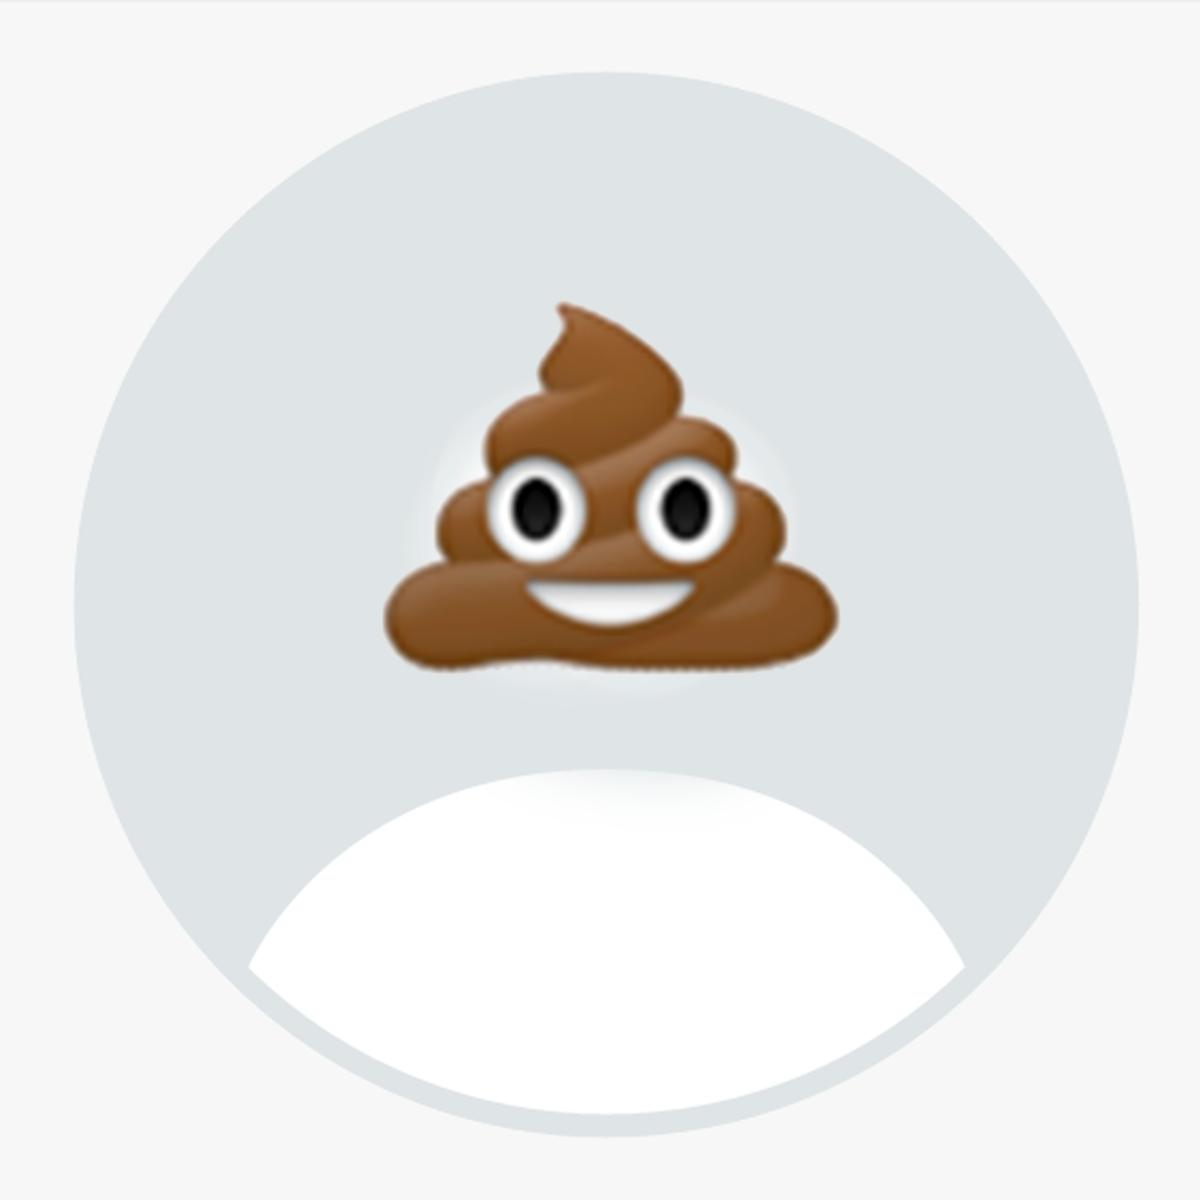 Profilbild lustig kein ingorodi: Kein